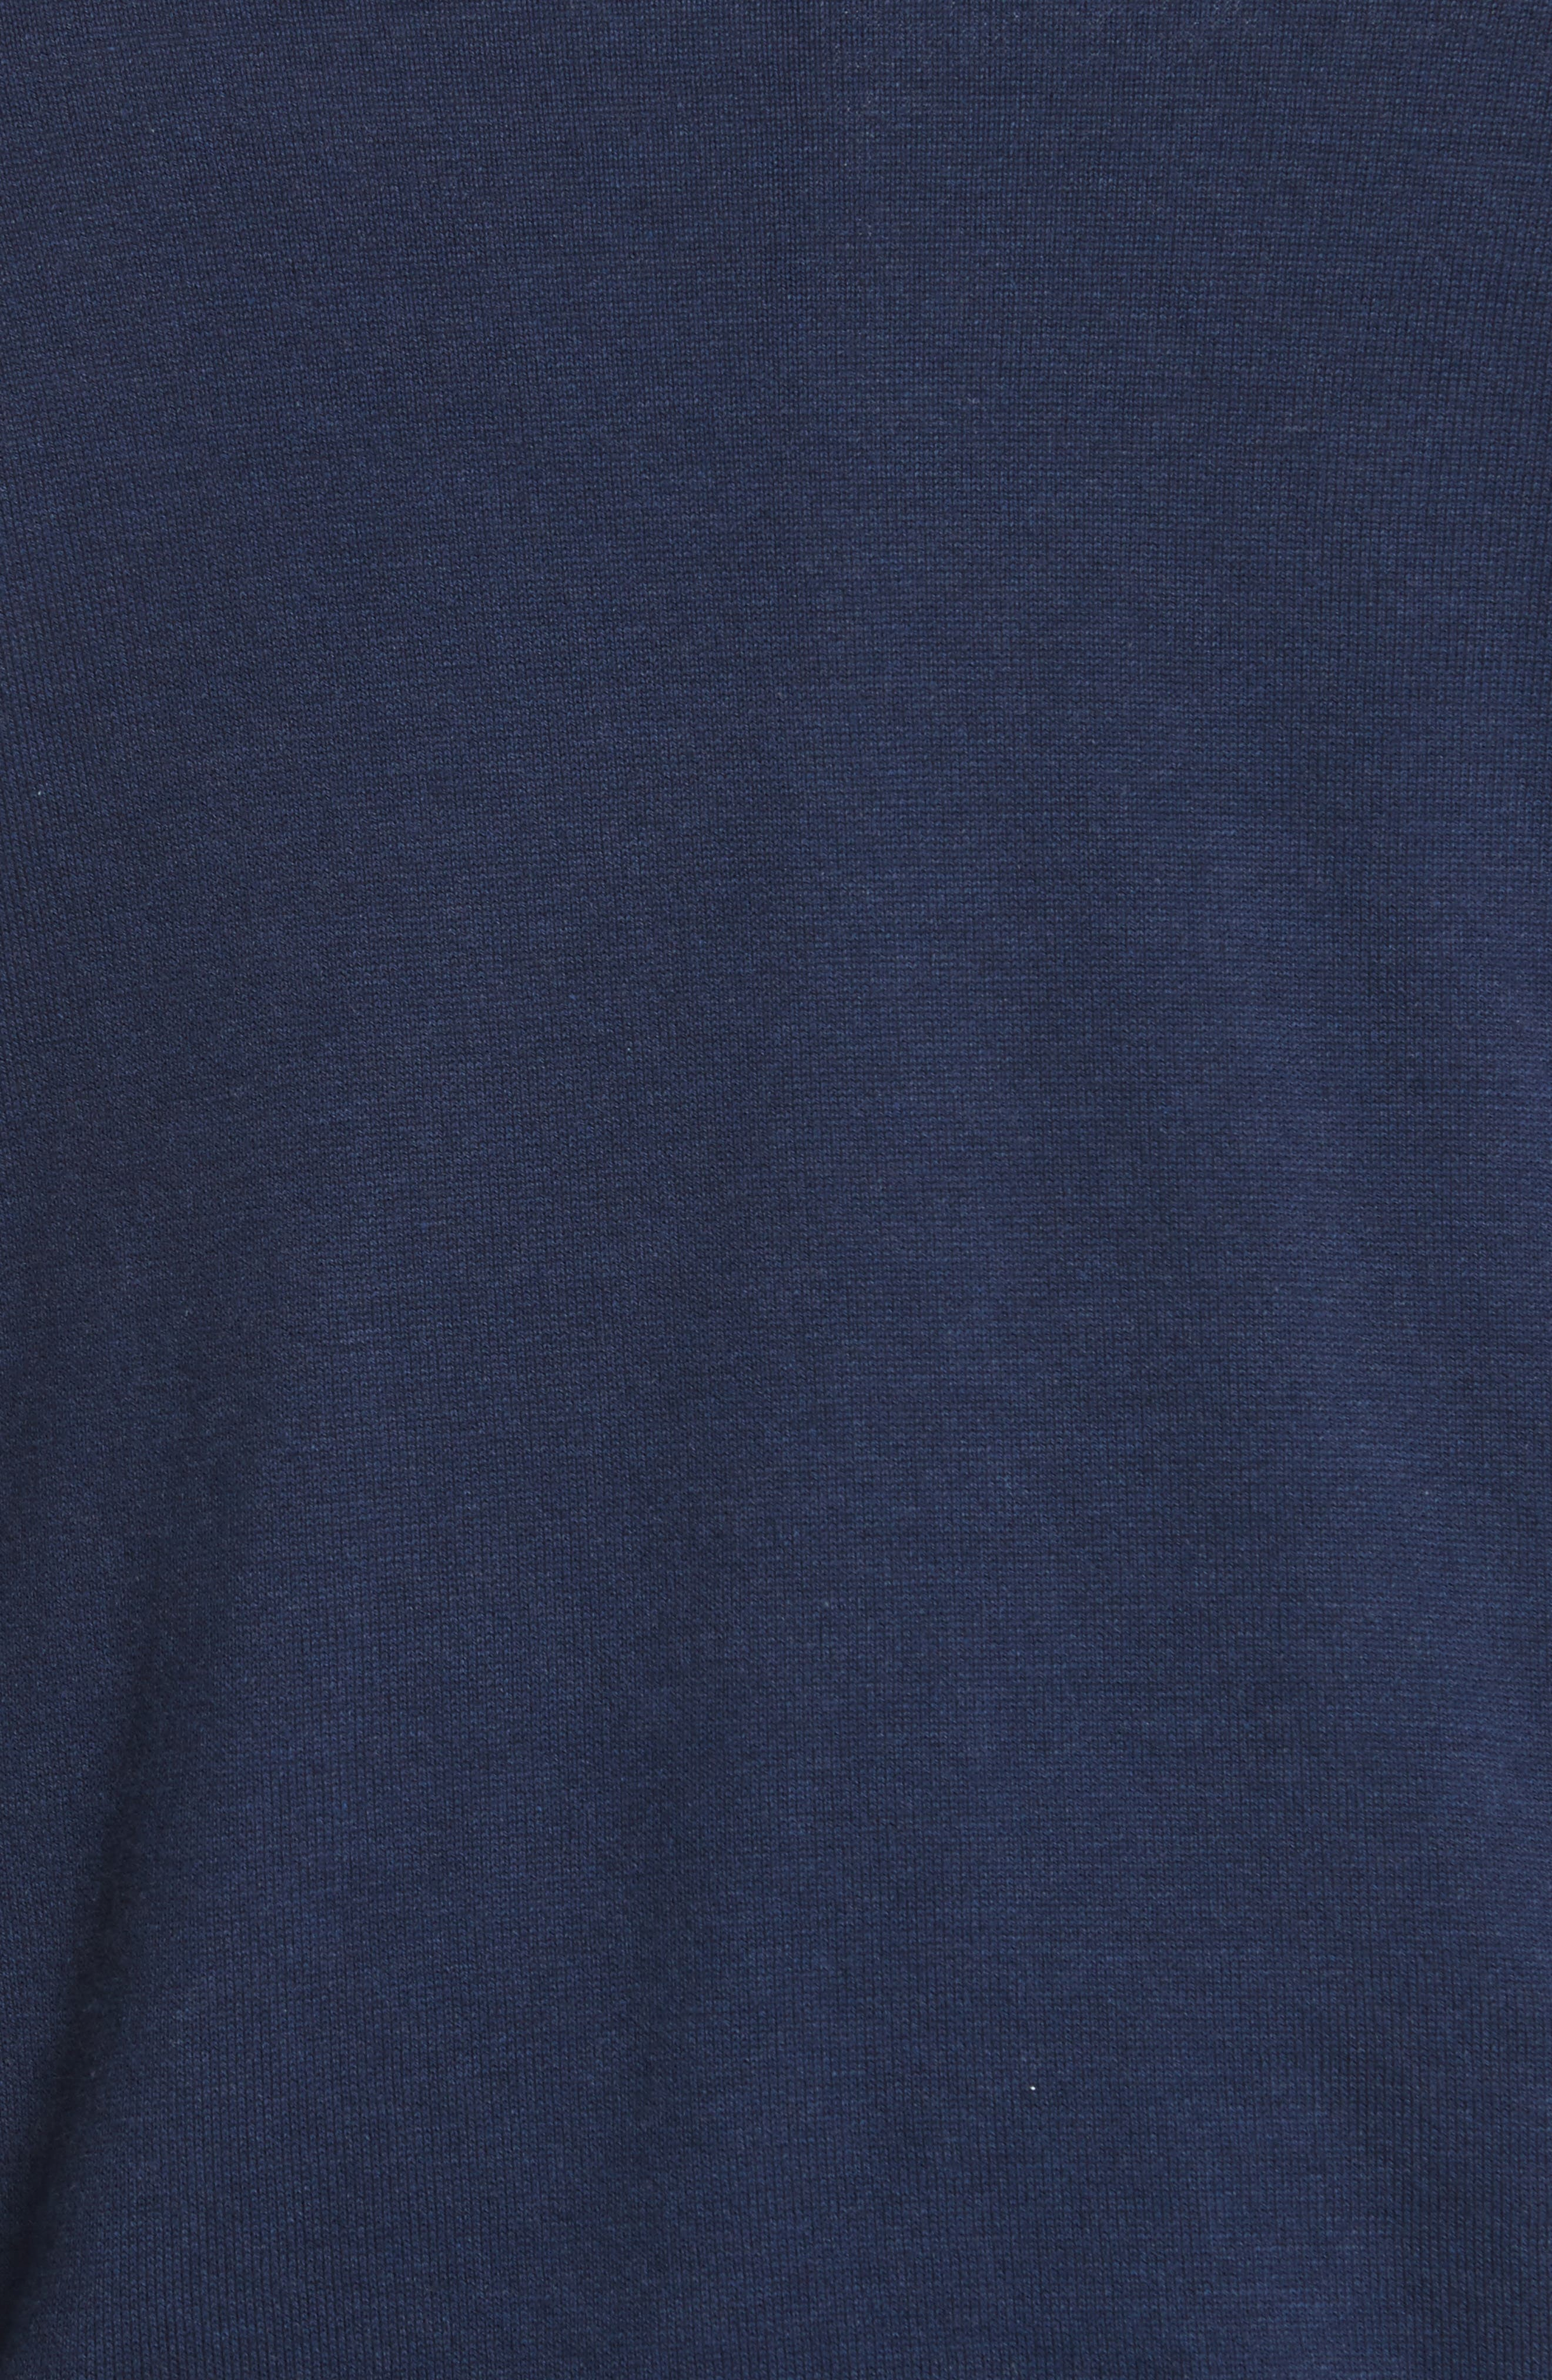 Quarter Zip Sweater,                             Alternate thumbnail 5, color,                             401